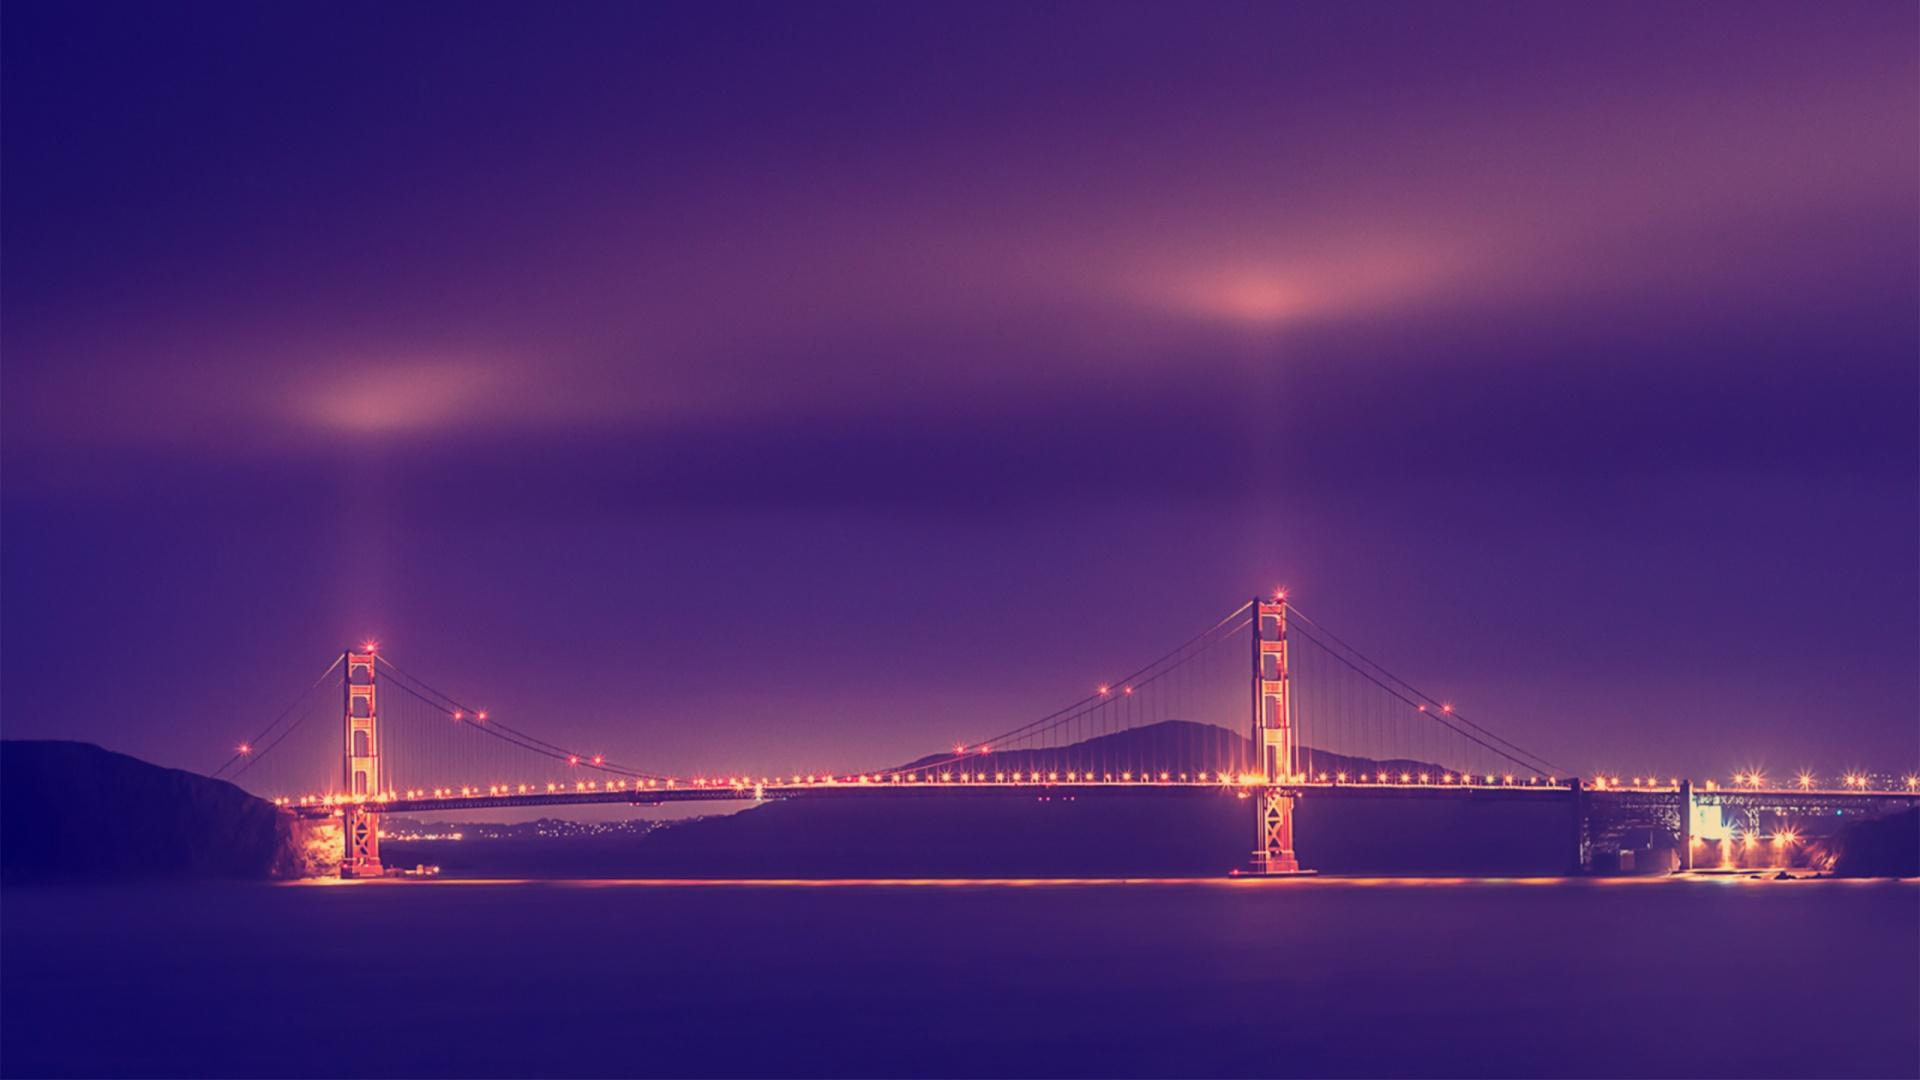 San Francisco Golden Gate Bridge Wallpapers In Jpg Format For Free